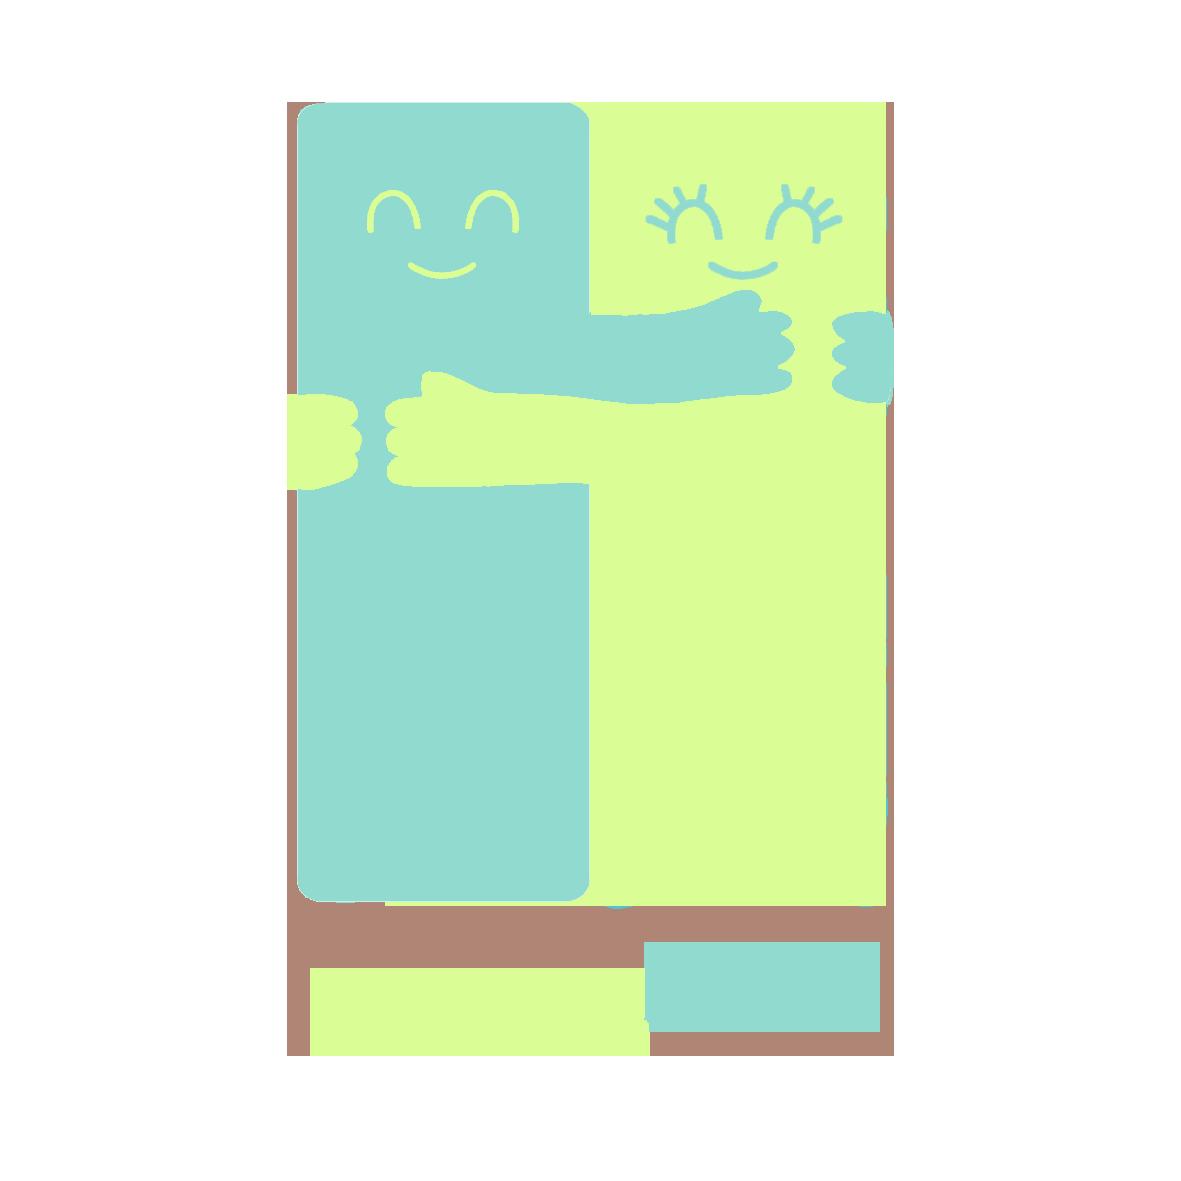 aequaland